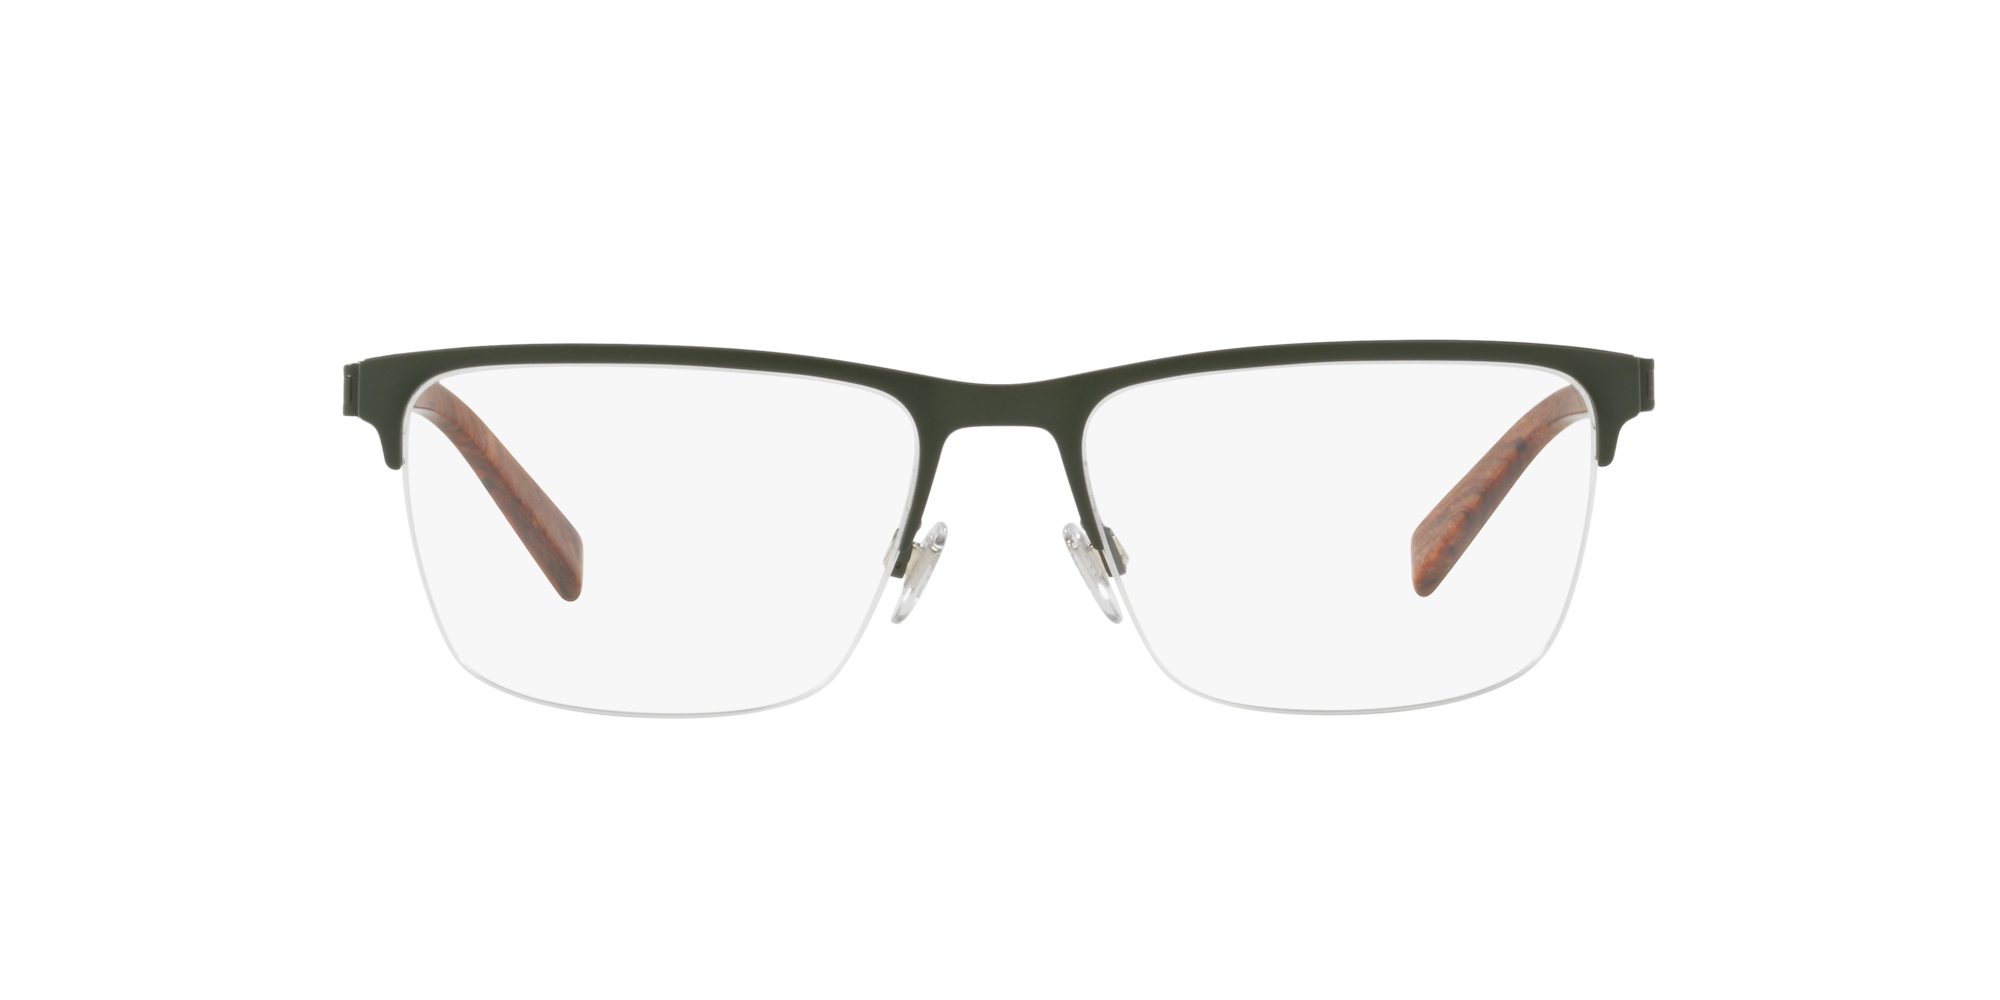 Image for RL5097 from LensCrafters | Glasses, Prescription Glasses Online, Eyewear